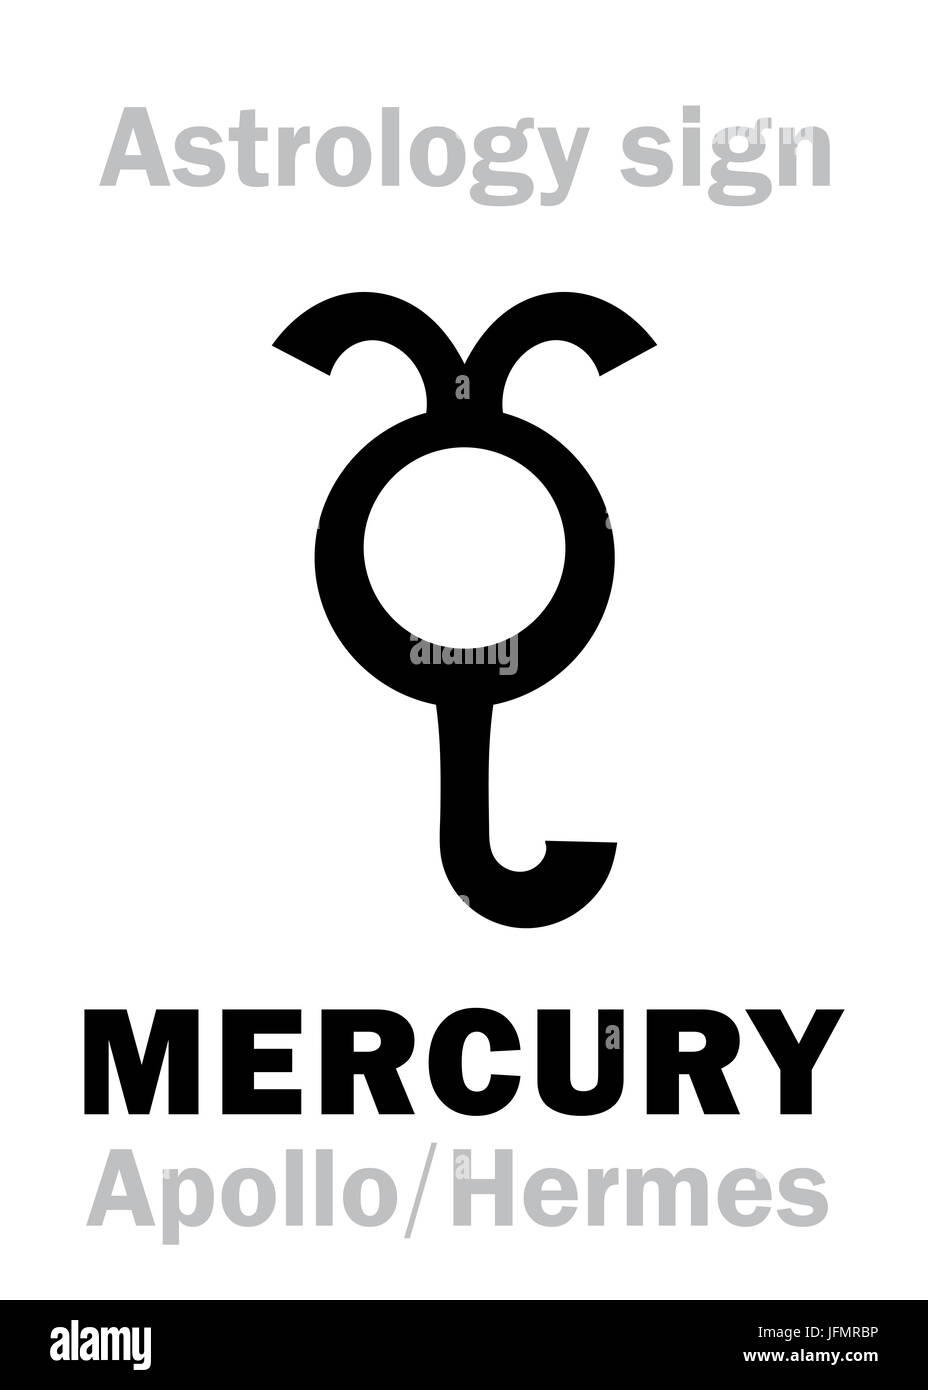 Astrology Planet Mercury Stock Photo 147360186 Alamy